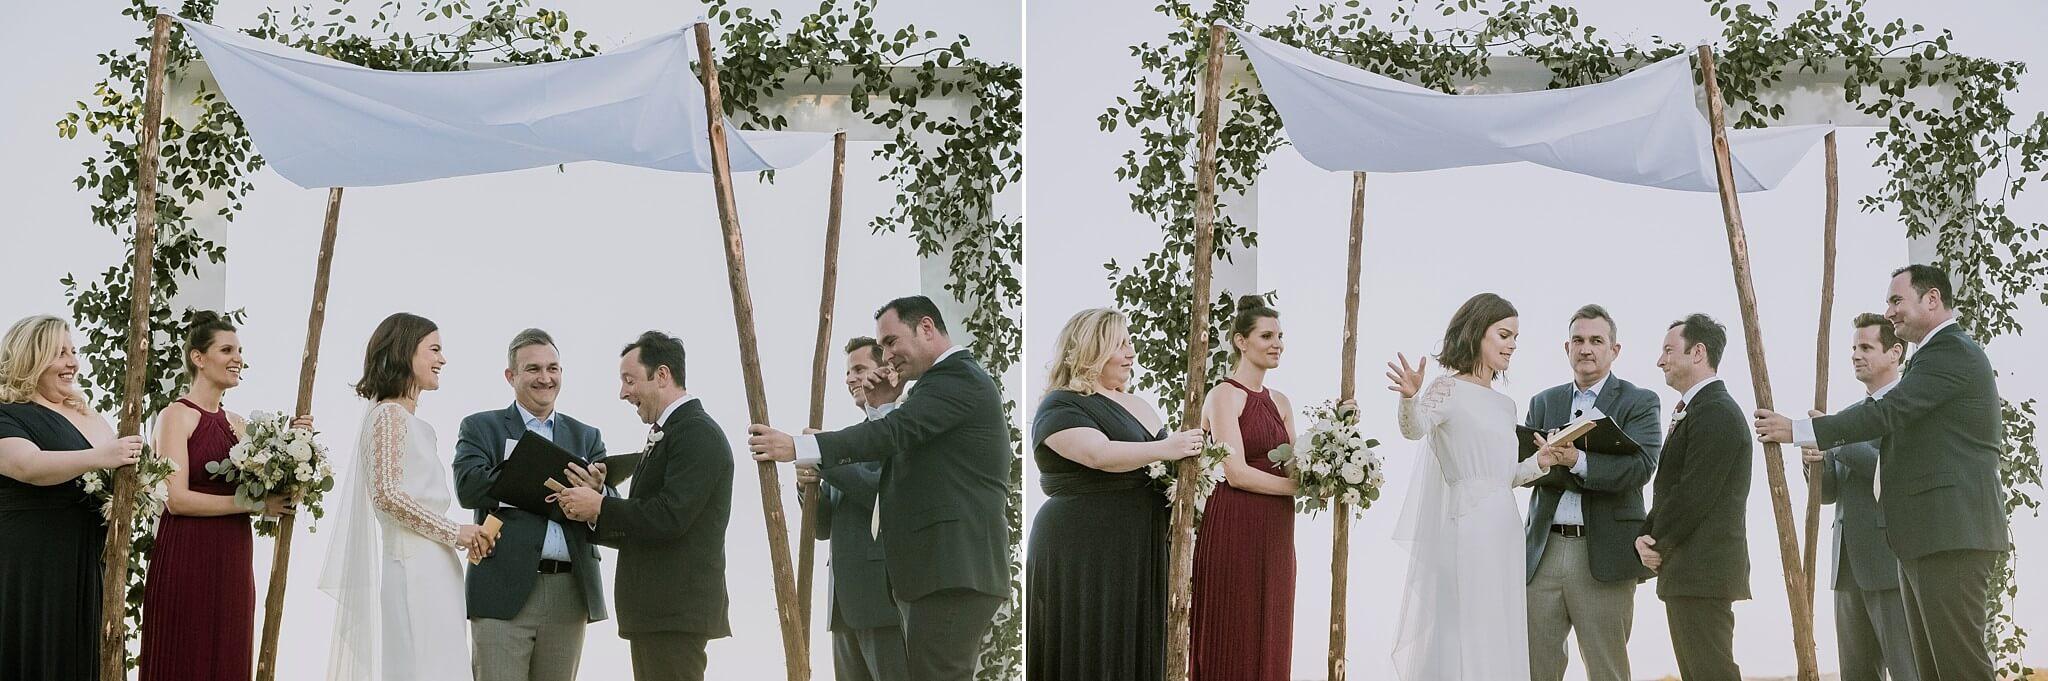 Prospect House Wedding Photographer_0019.jpg